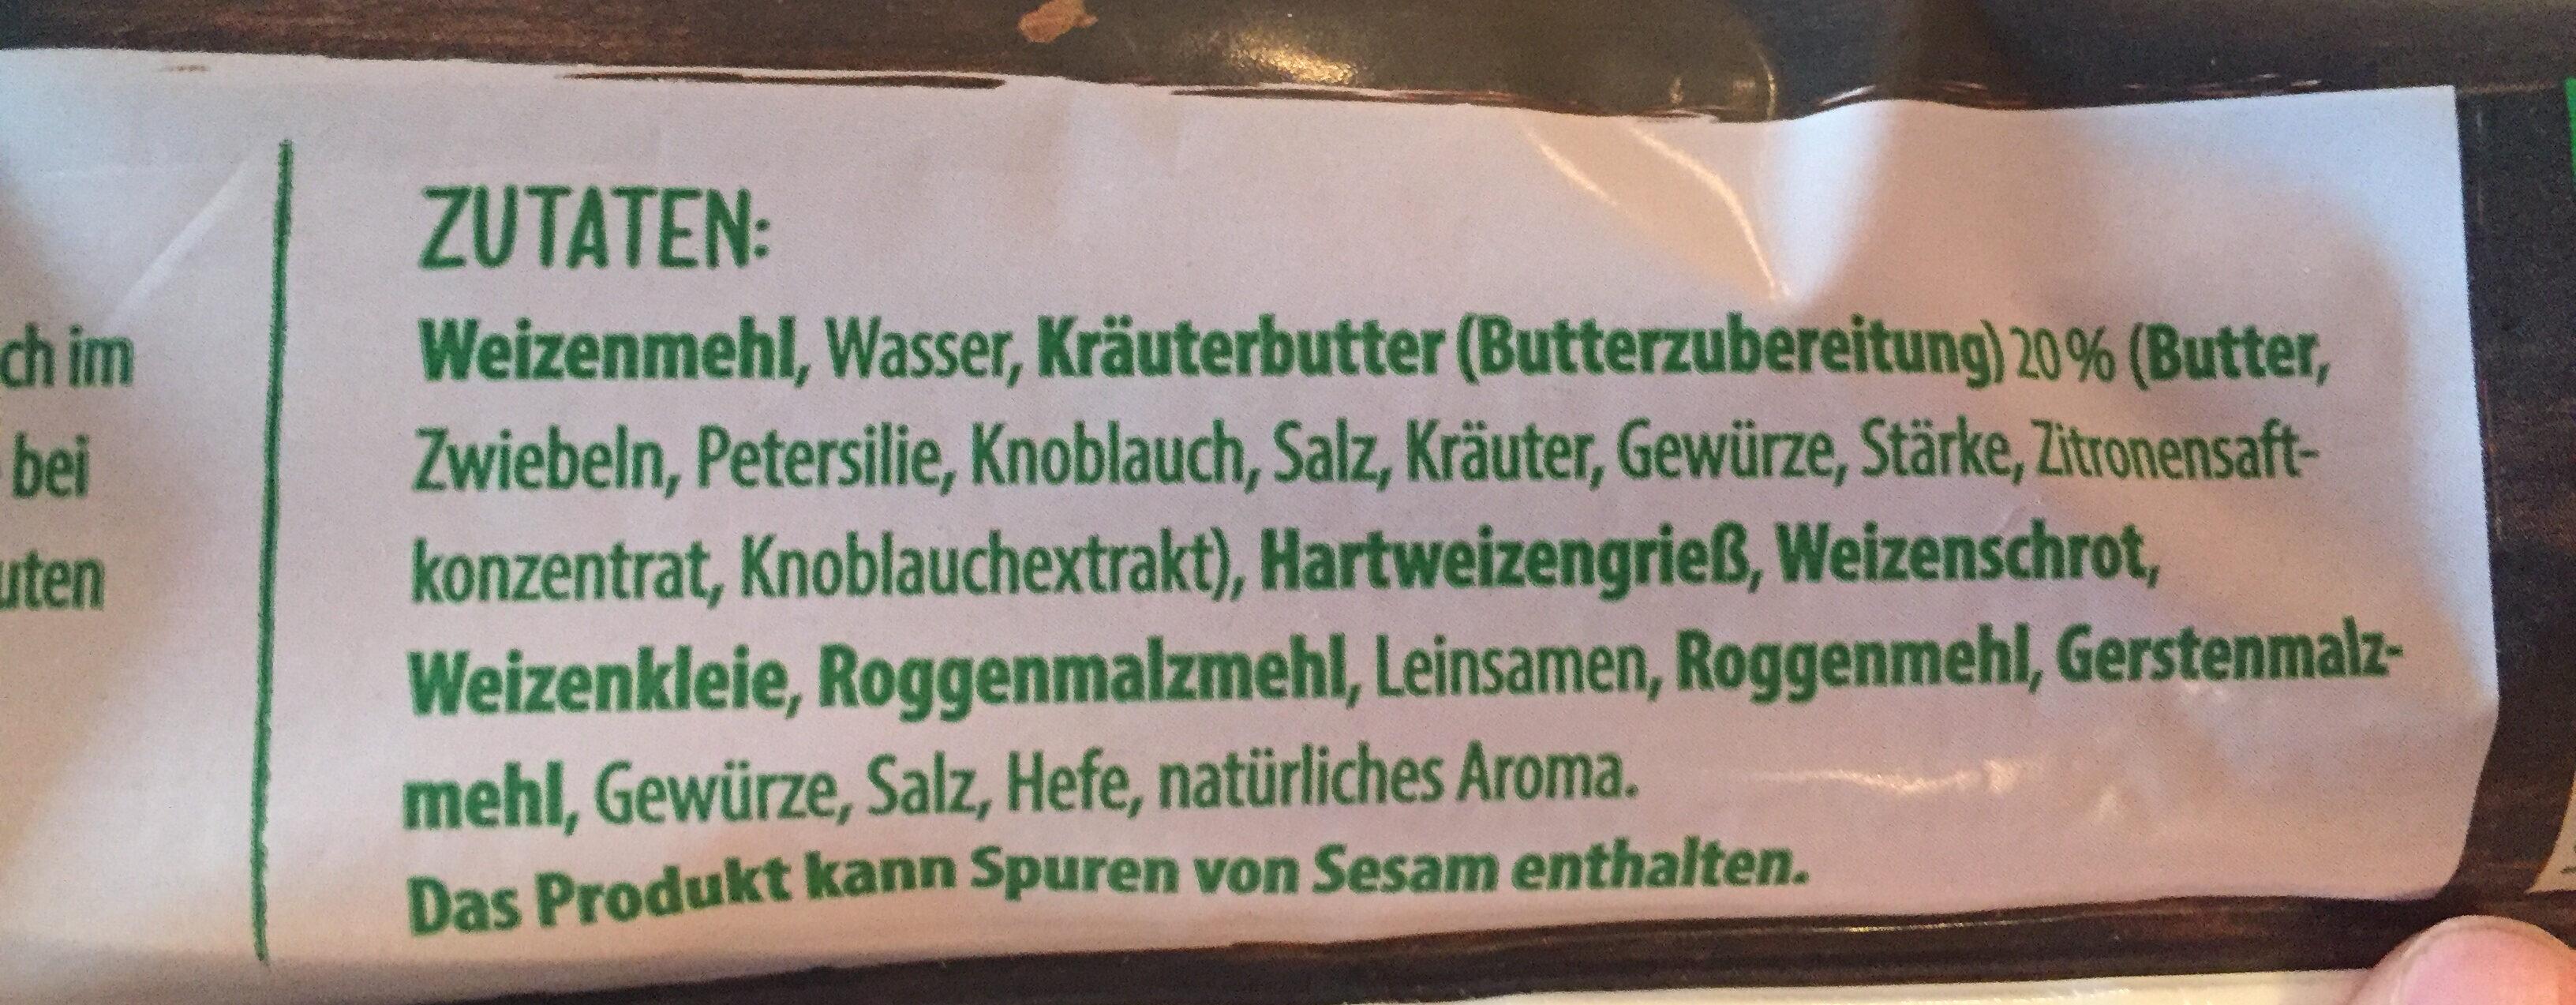 Rustikal Baguette Kräuter Butter - Ingredients - de